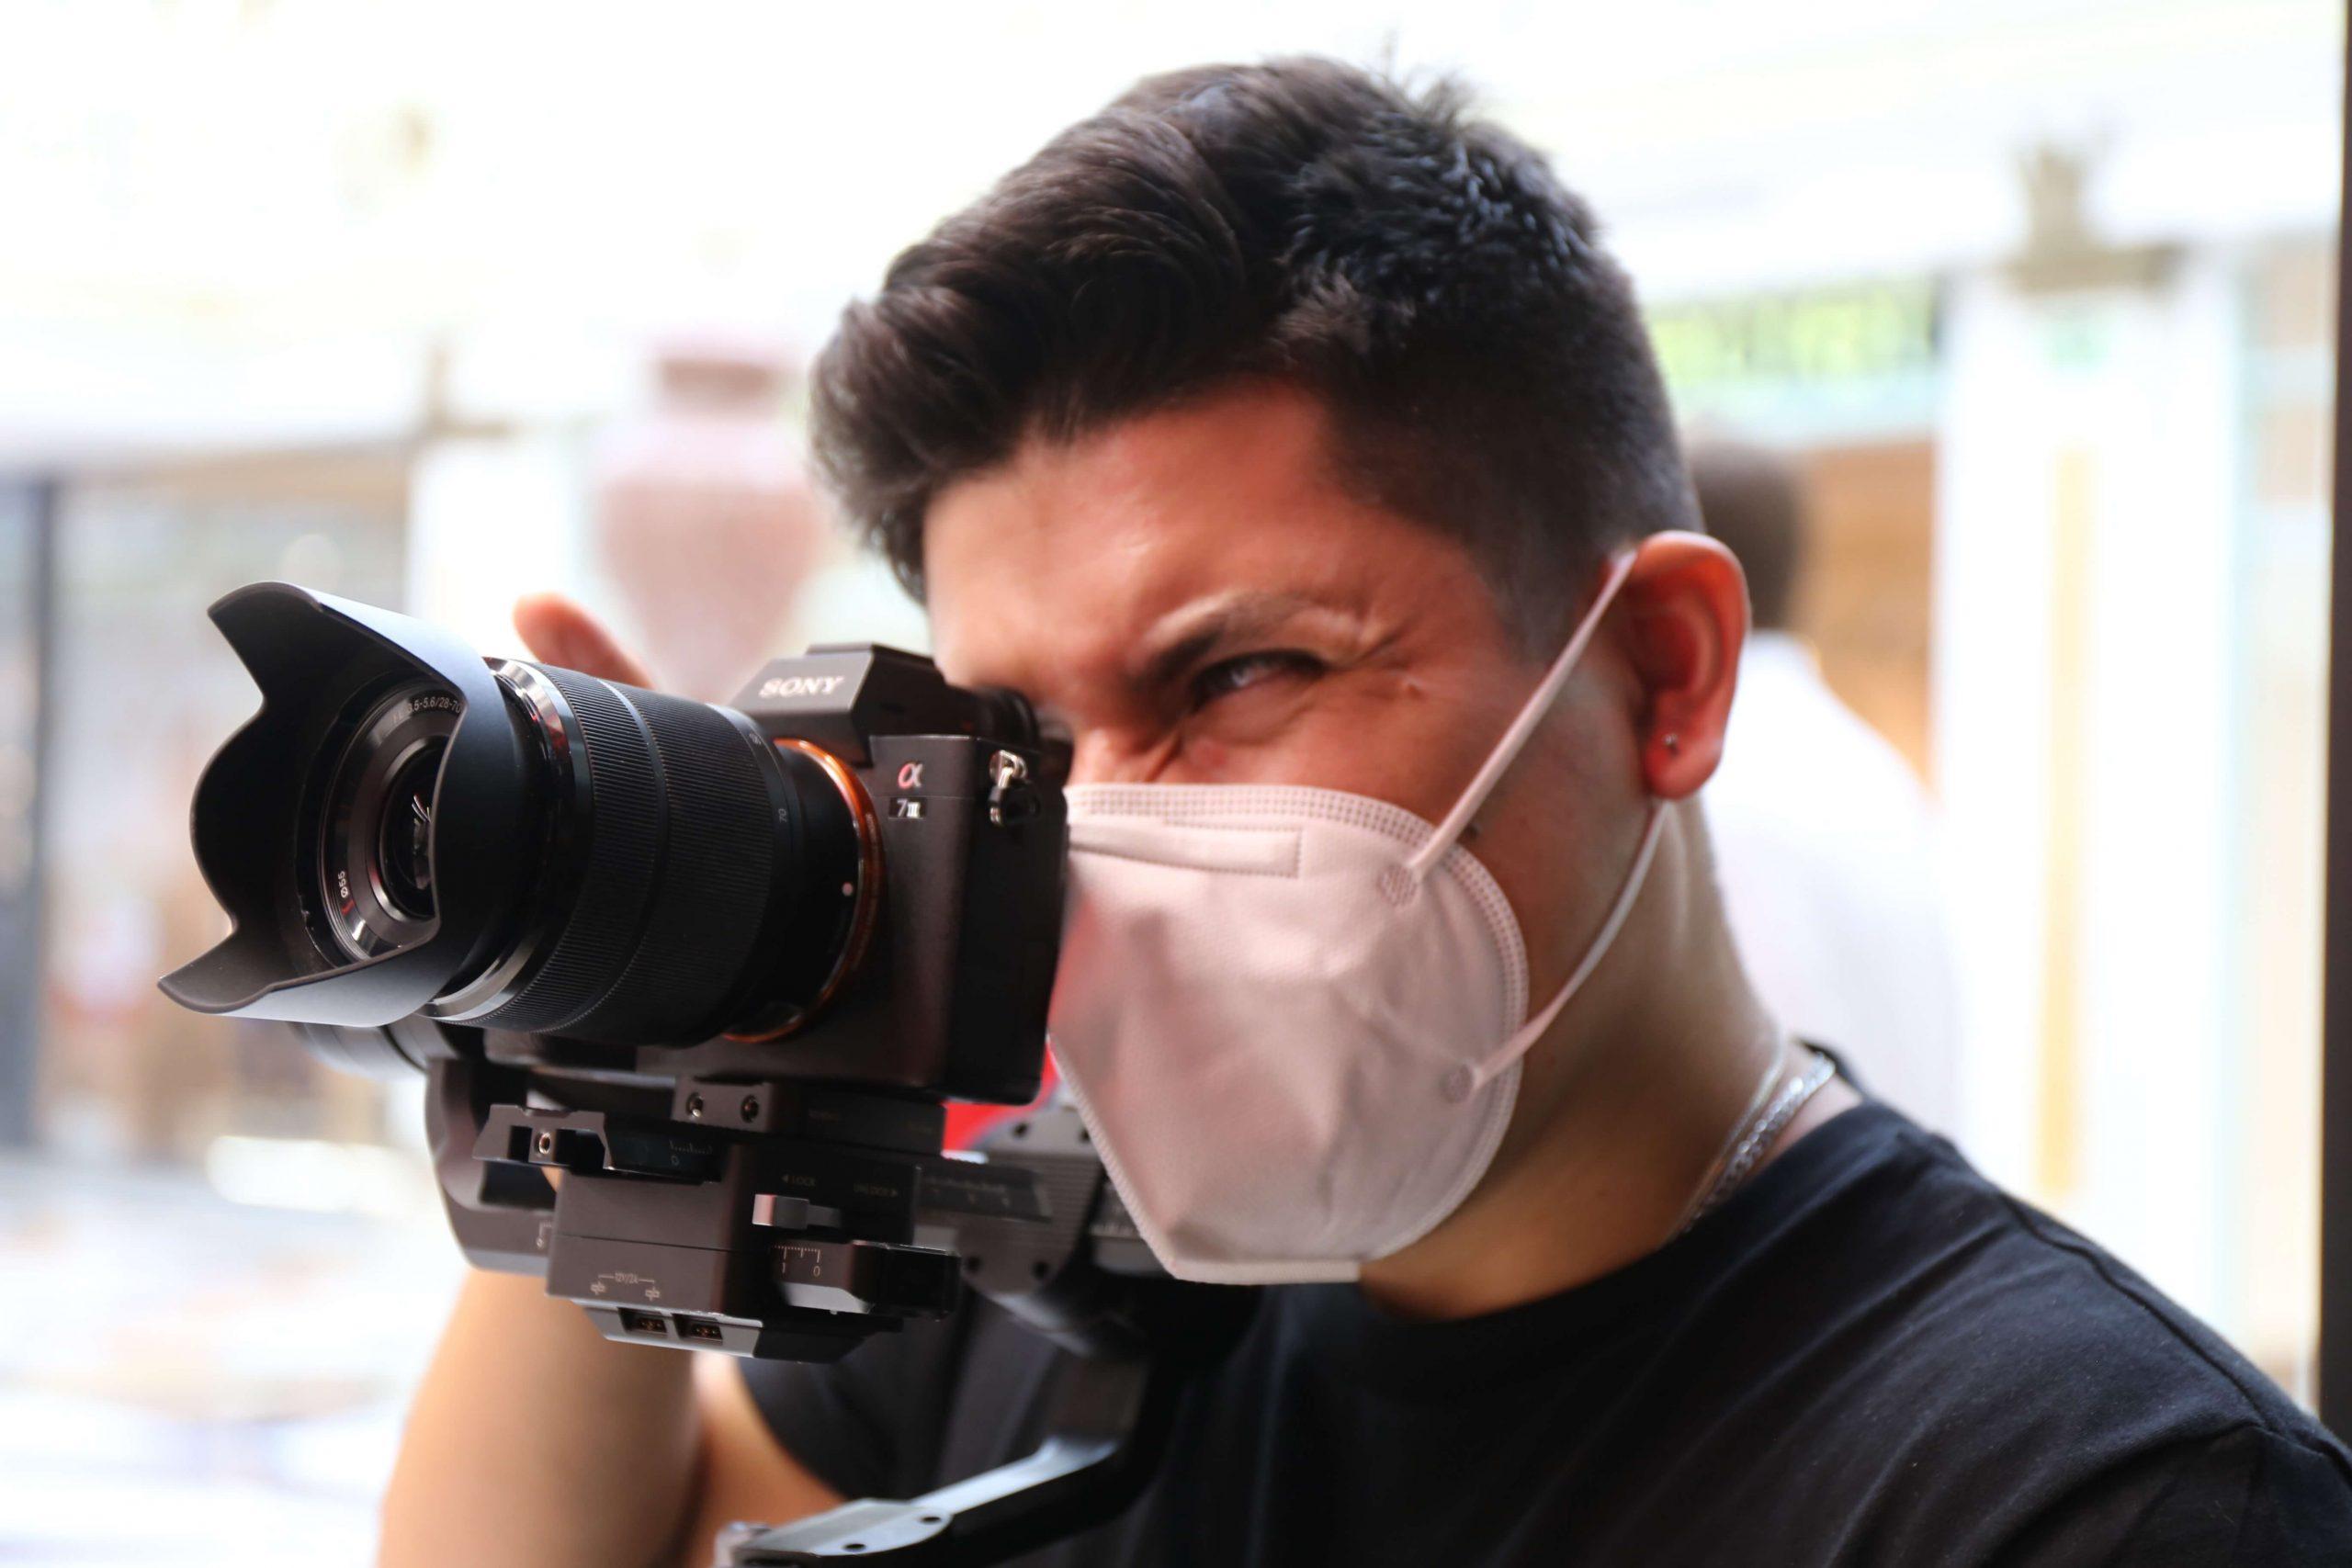 Occam Agencia Digital productora audiovisual 360